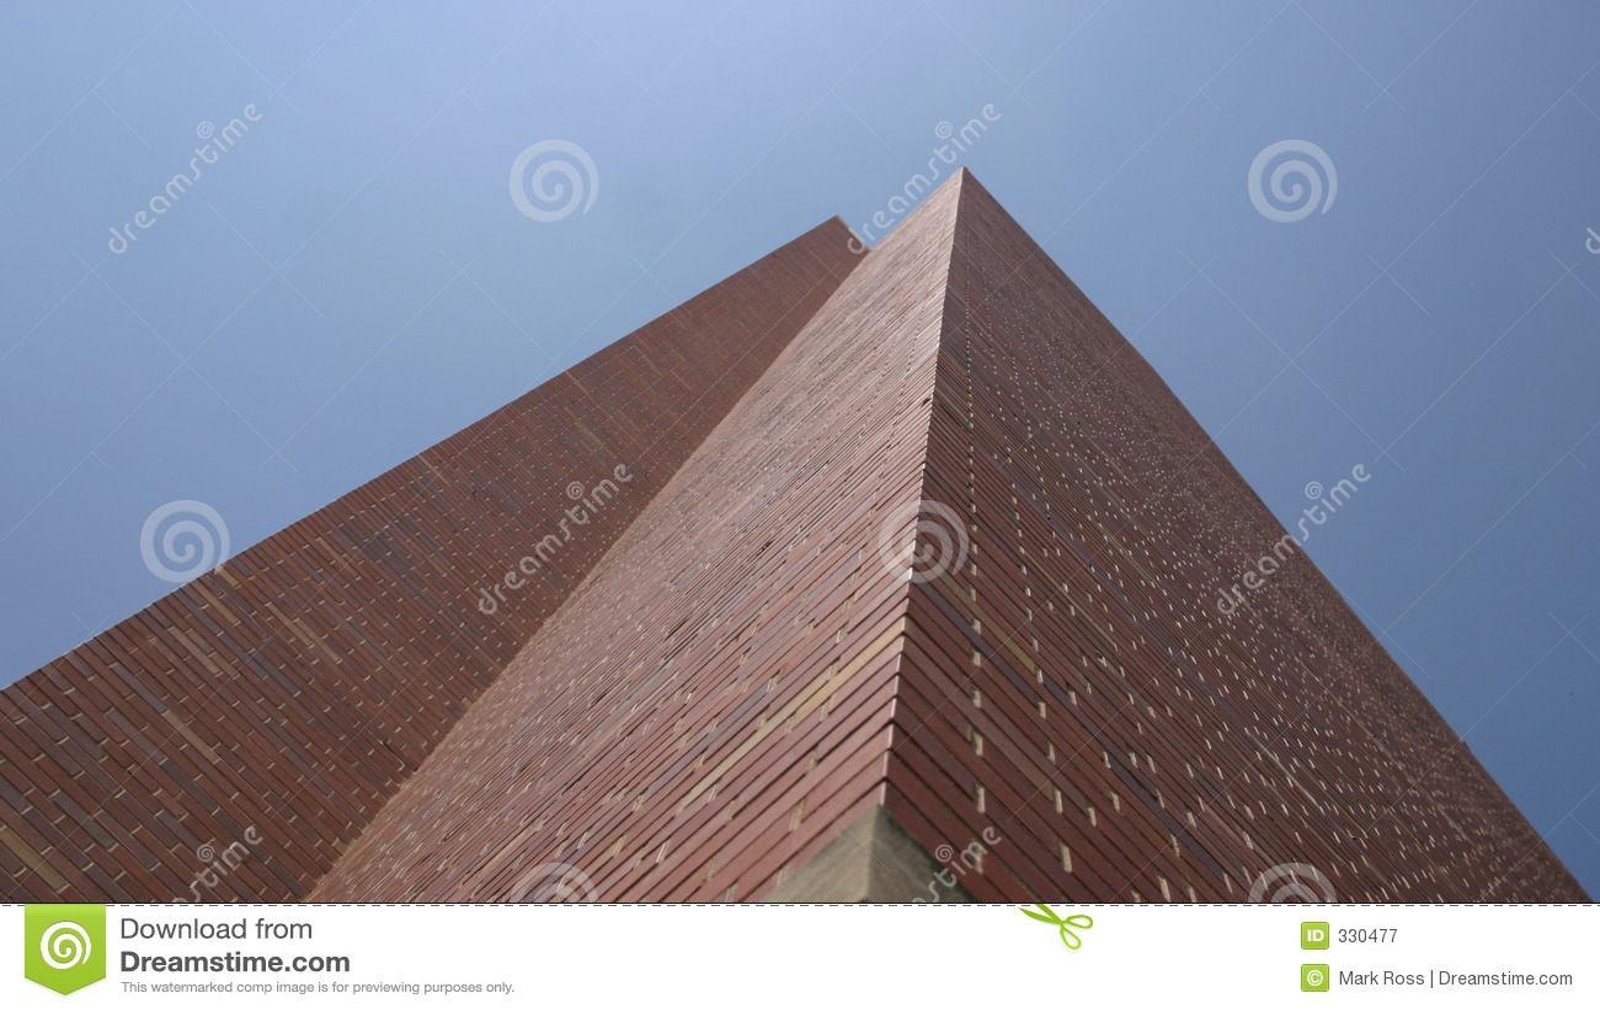 tall brick building stock image image of skyscraper blue 330477. Black Bedroom Furniture Sets. Home Design Ideas